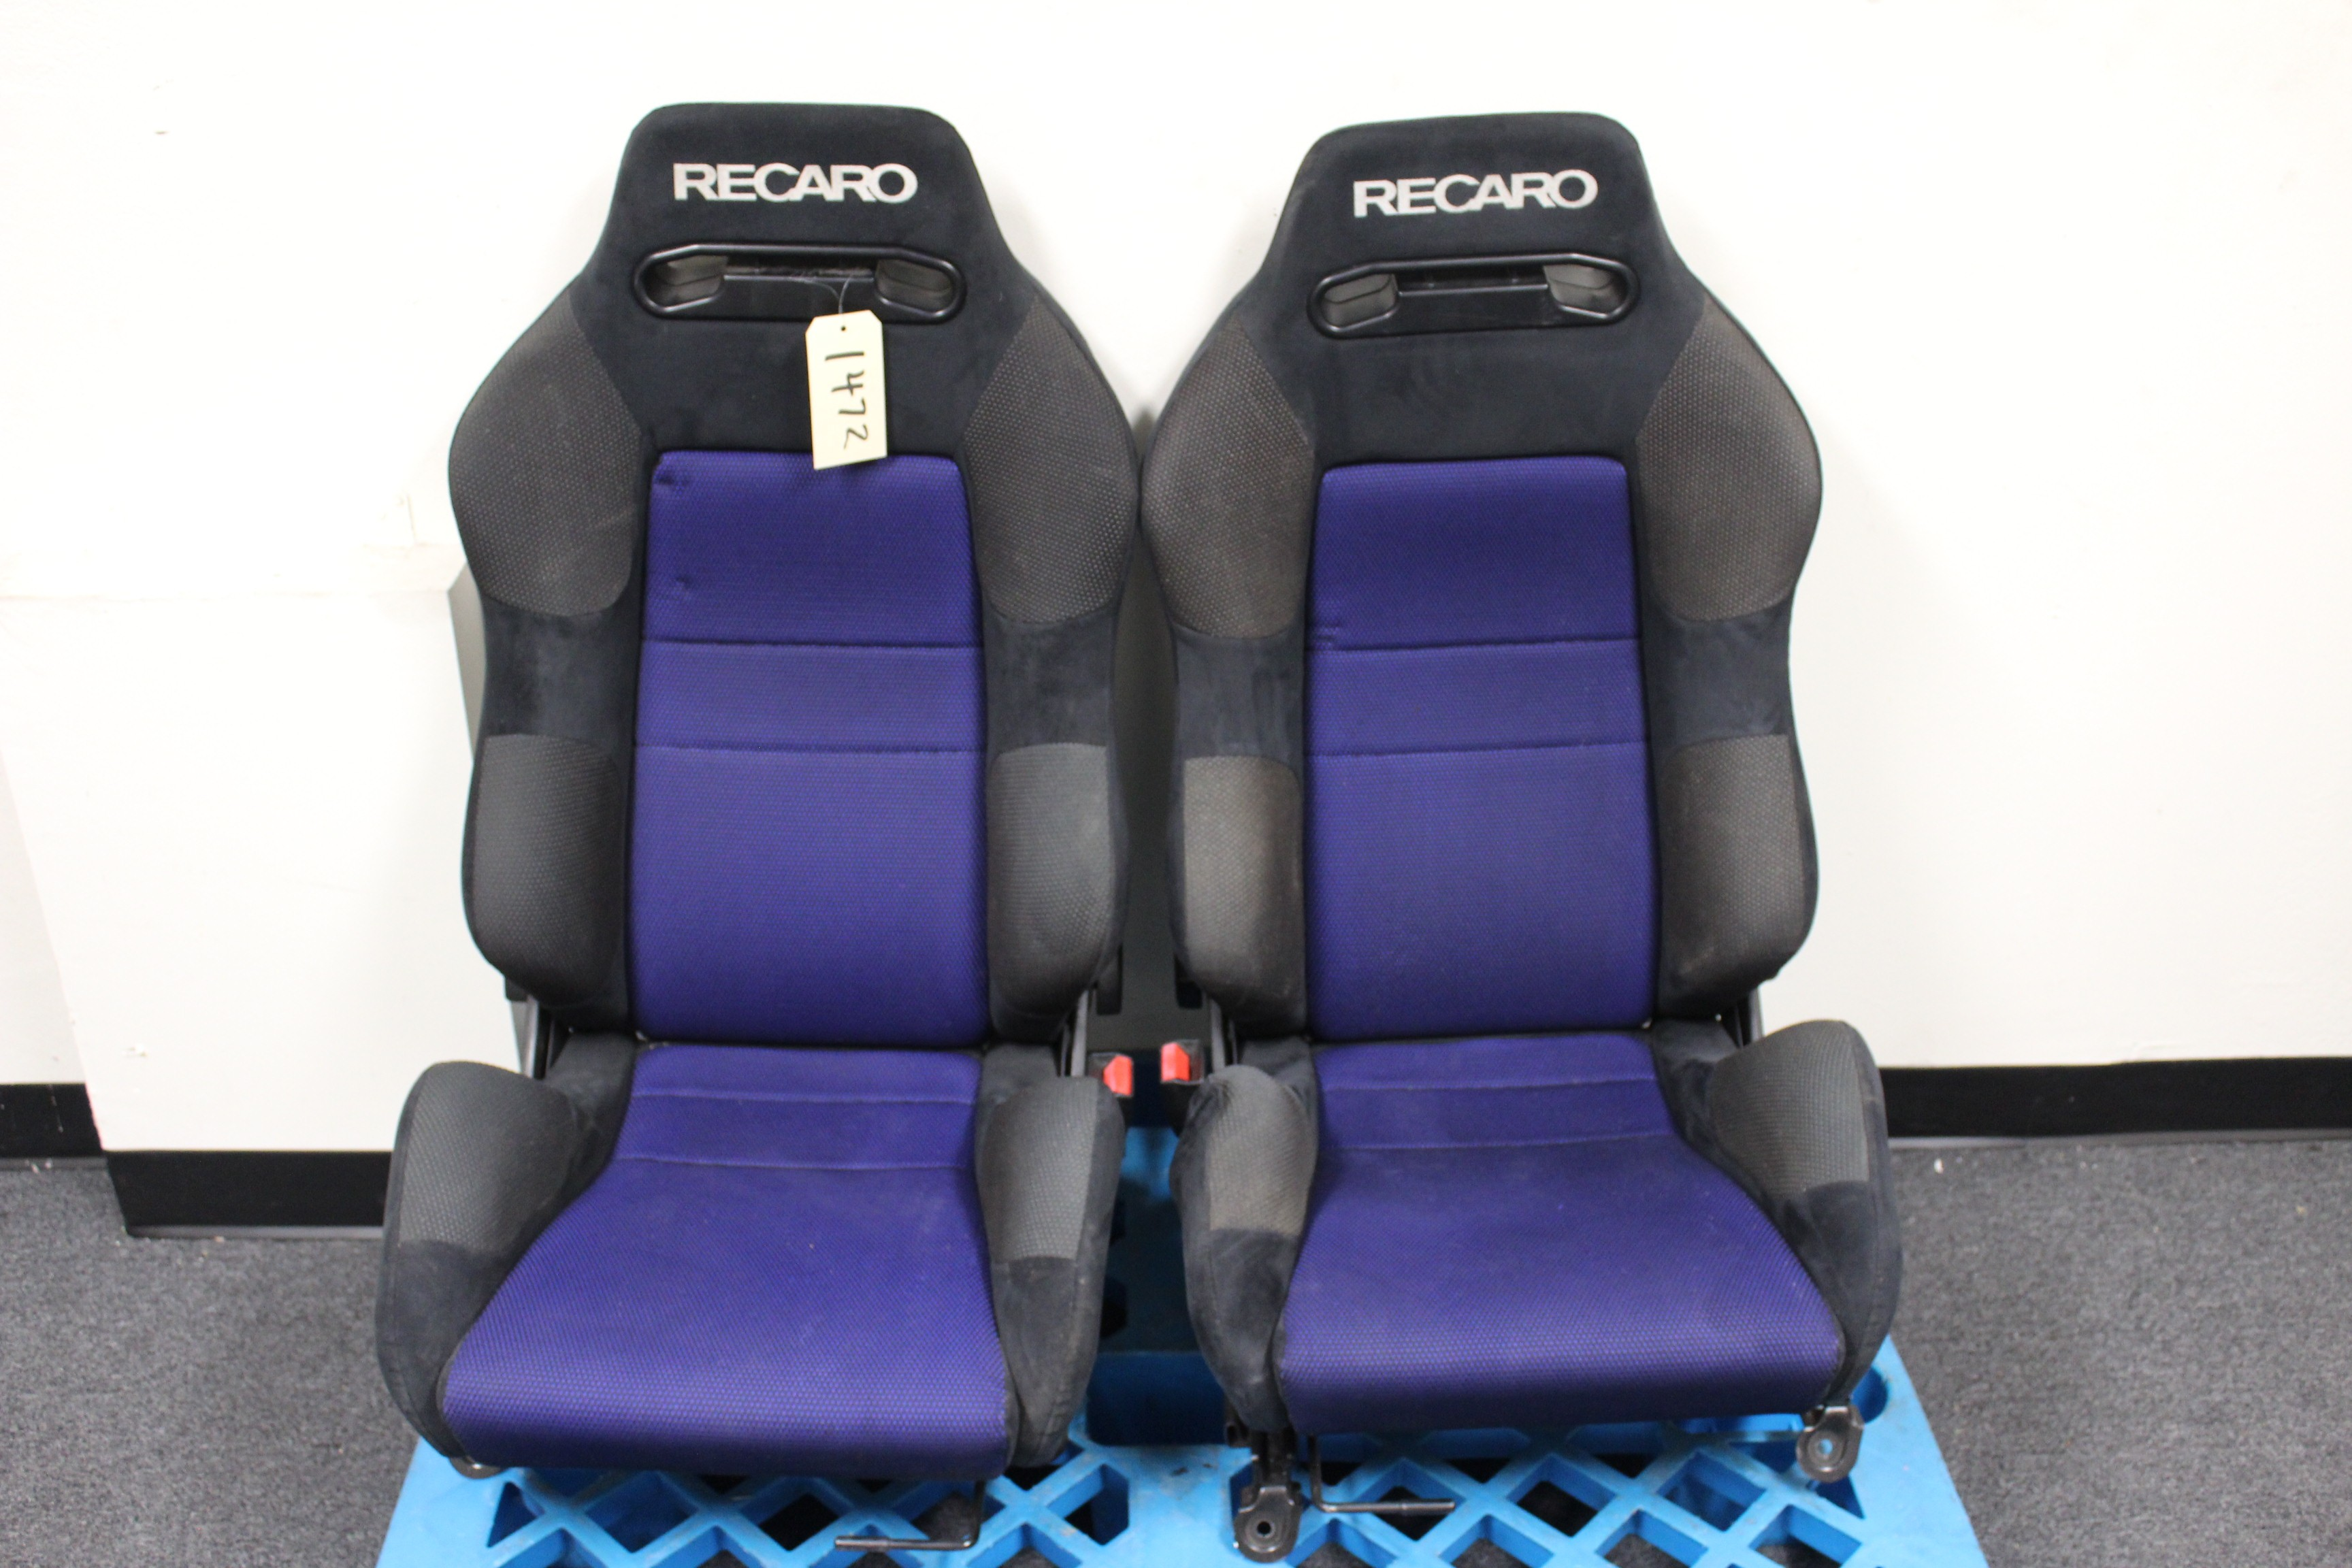 Recaro Racing Seats W Subaru Impreza Wrx Sti Seat Rails Jdm Seats Accessories